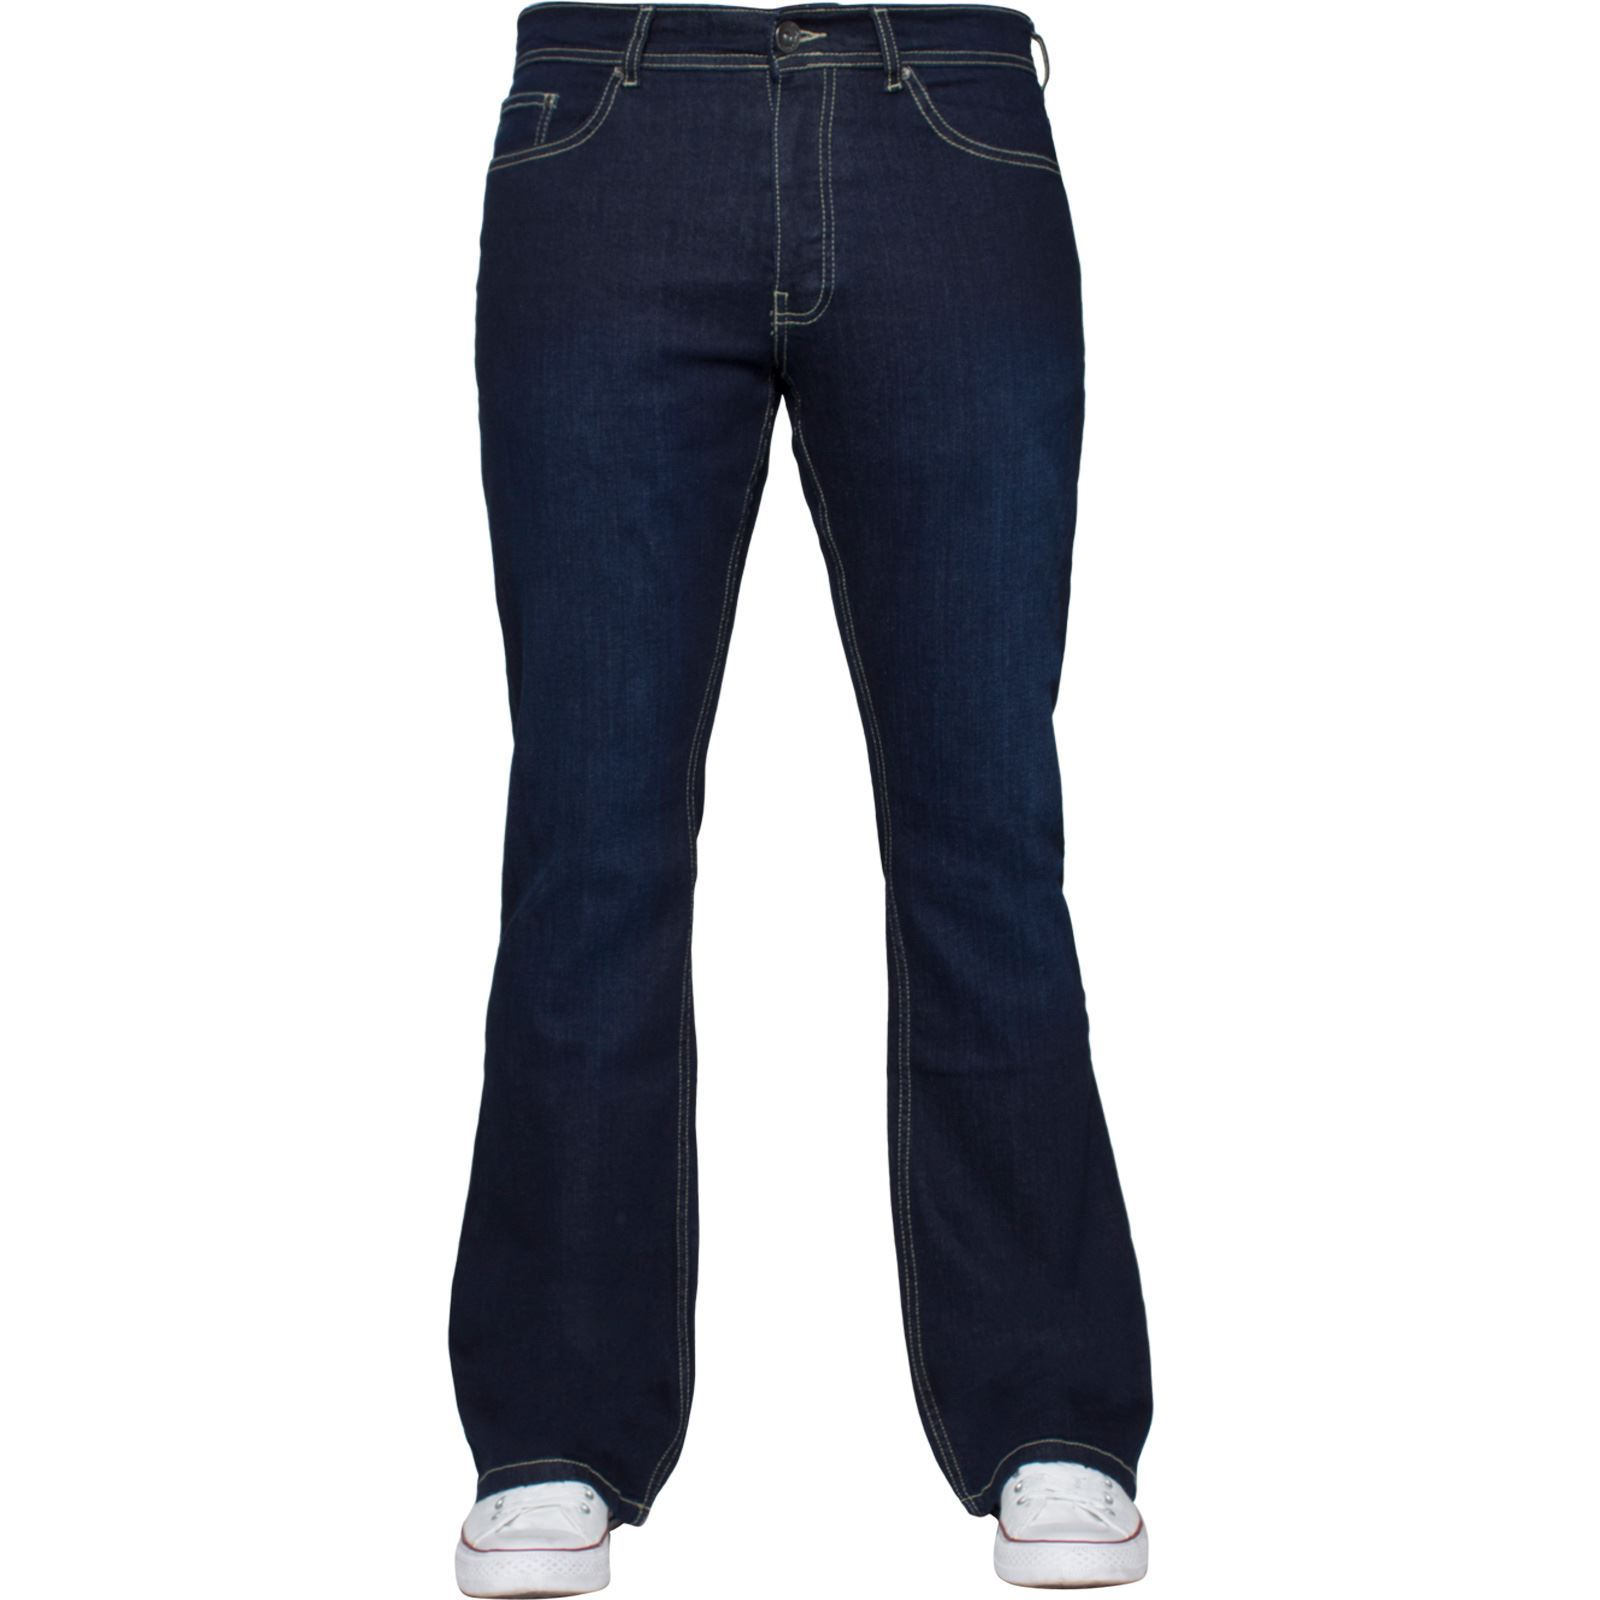 Para-Hombre-Pierna-Recta-Bootcut-Stretch-Denim-Regulares-Pantalon-de-trabajo-Kruze-Todas-Cinturas miniatura 92